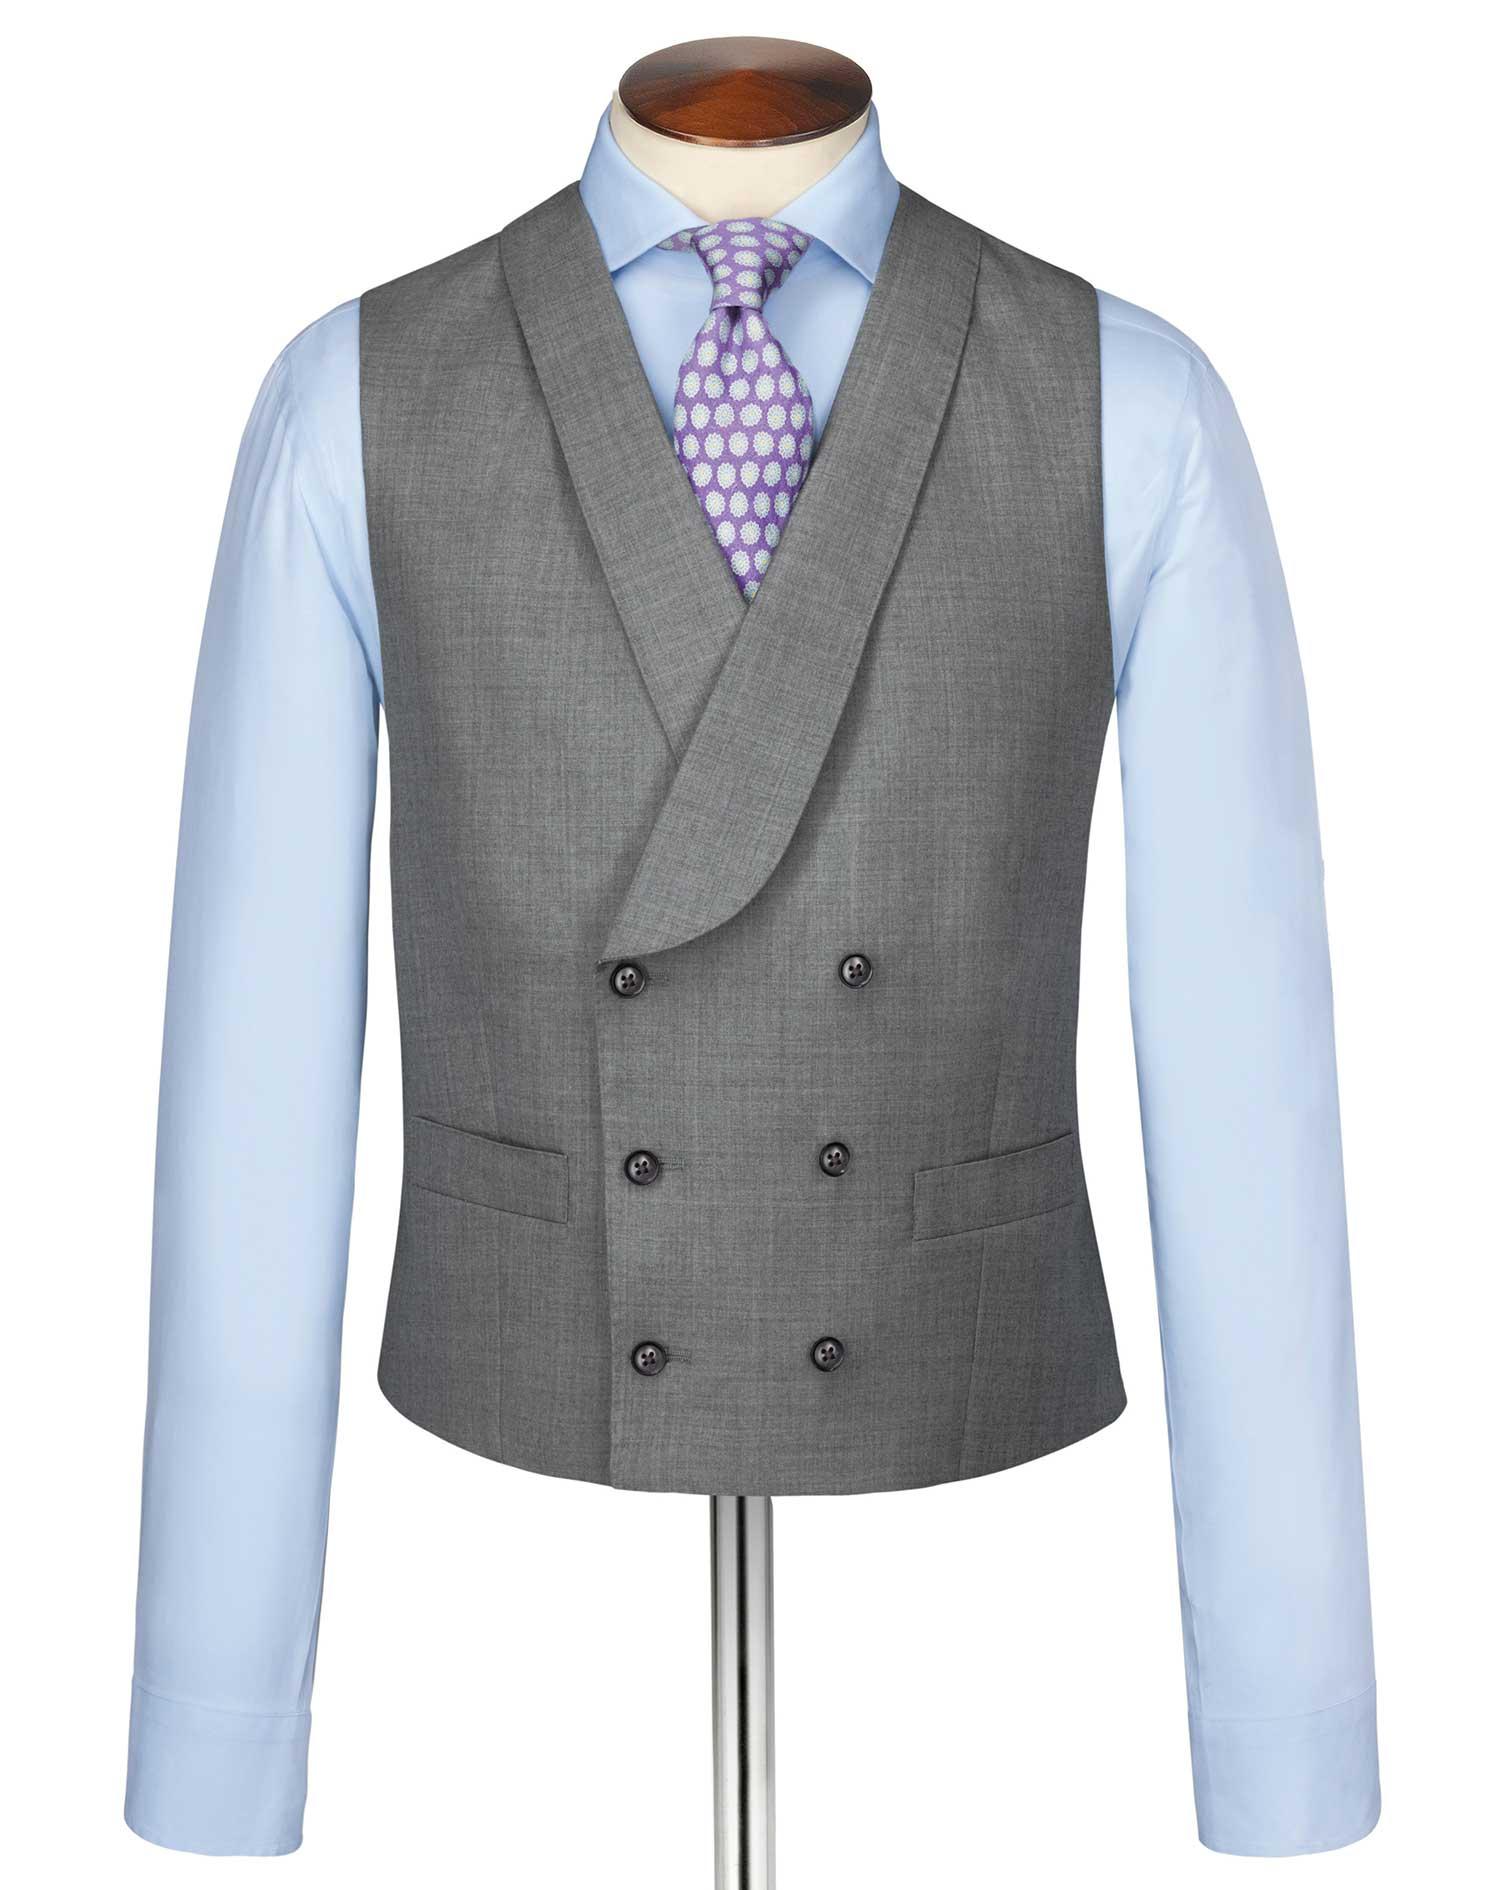 Silver Adjustable Fit British Panama Luxury Suit Wool Waistcoat Size w42 by Charles Tyrwhitt